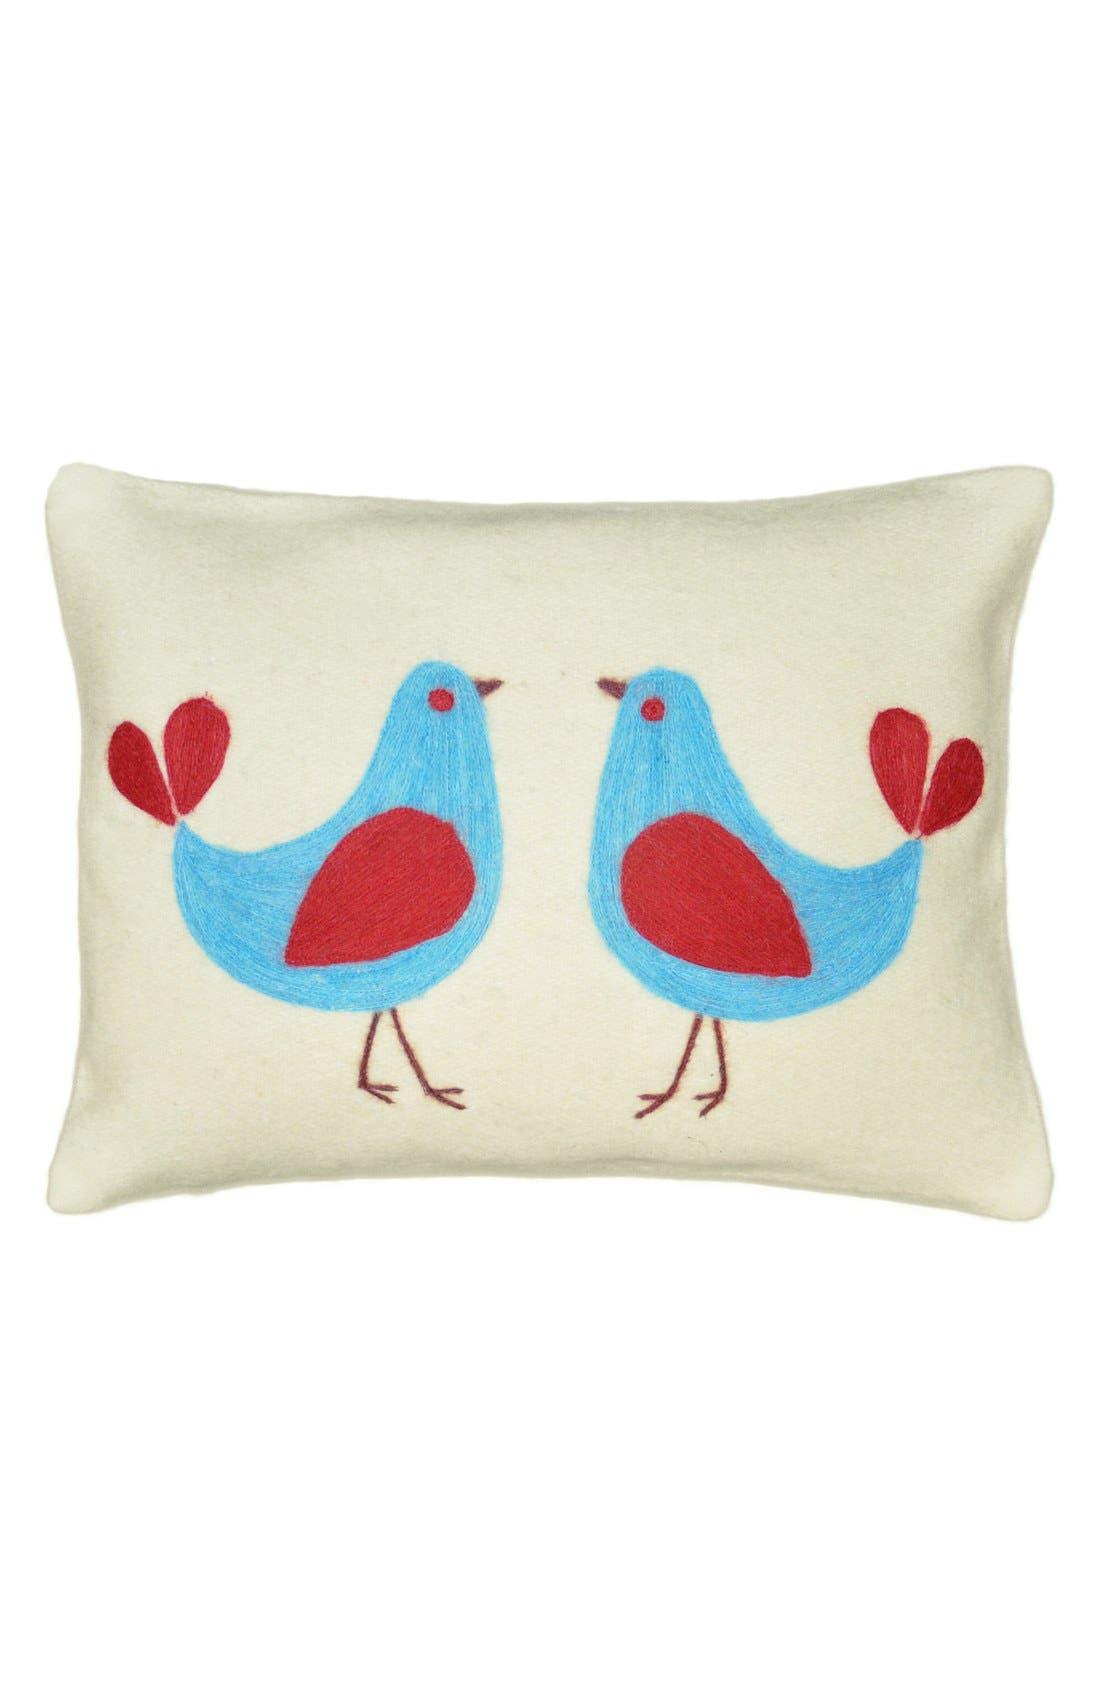 Main Image - Amity Home 'Twin Bird' Decorative Pillow